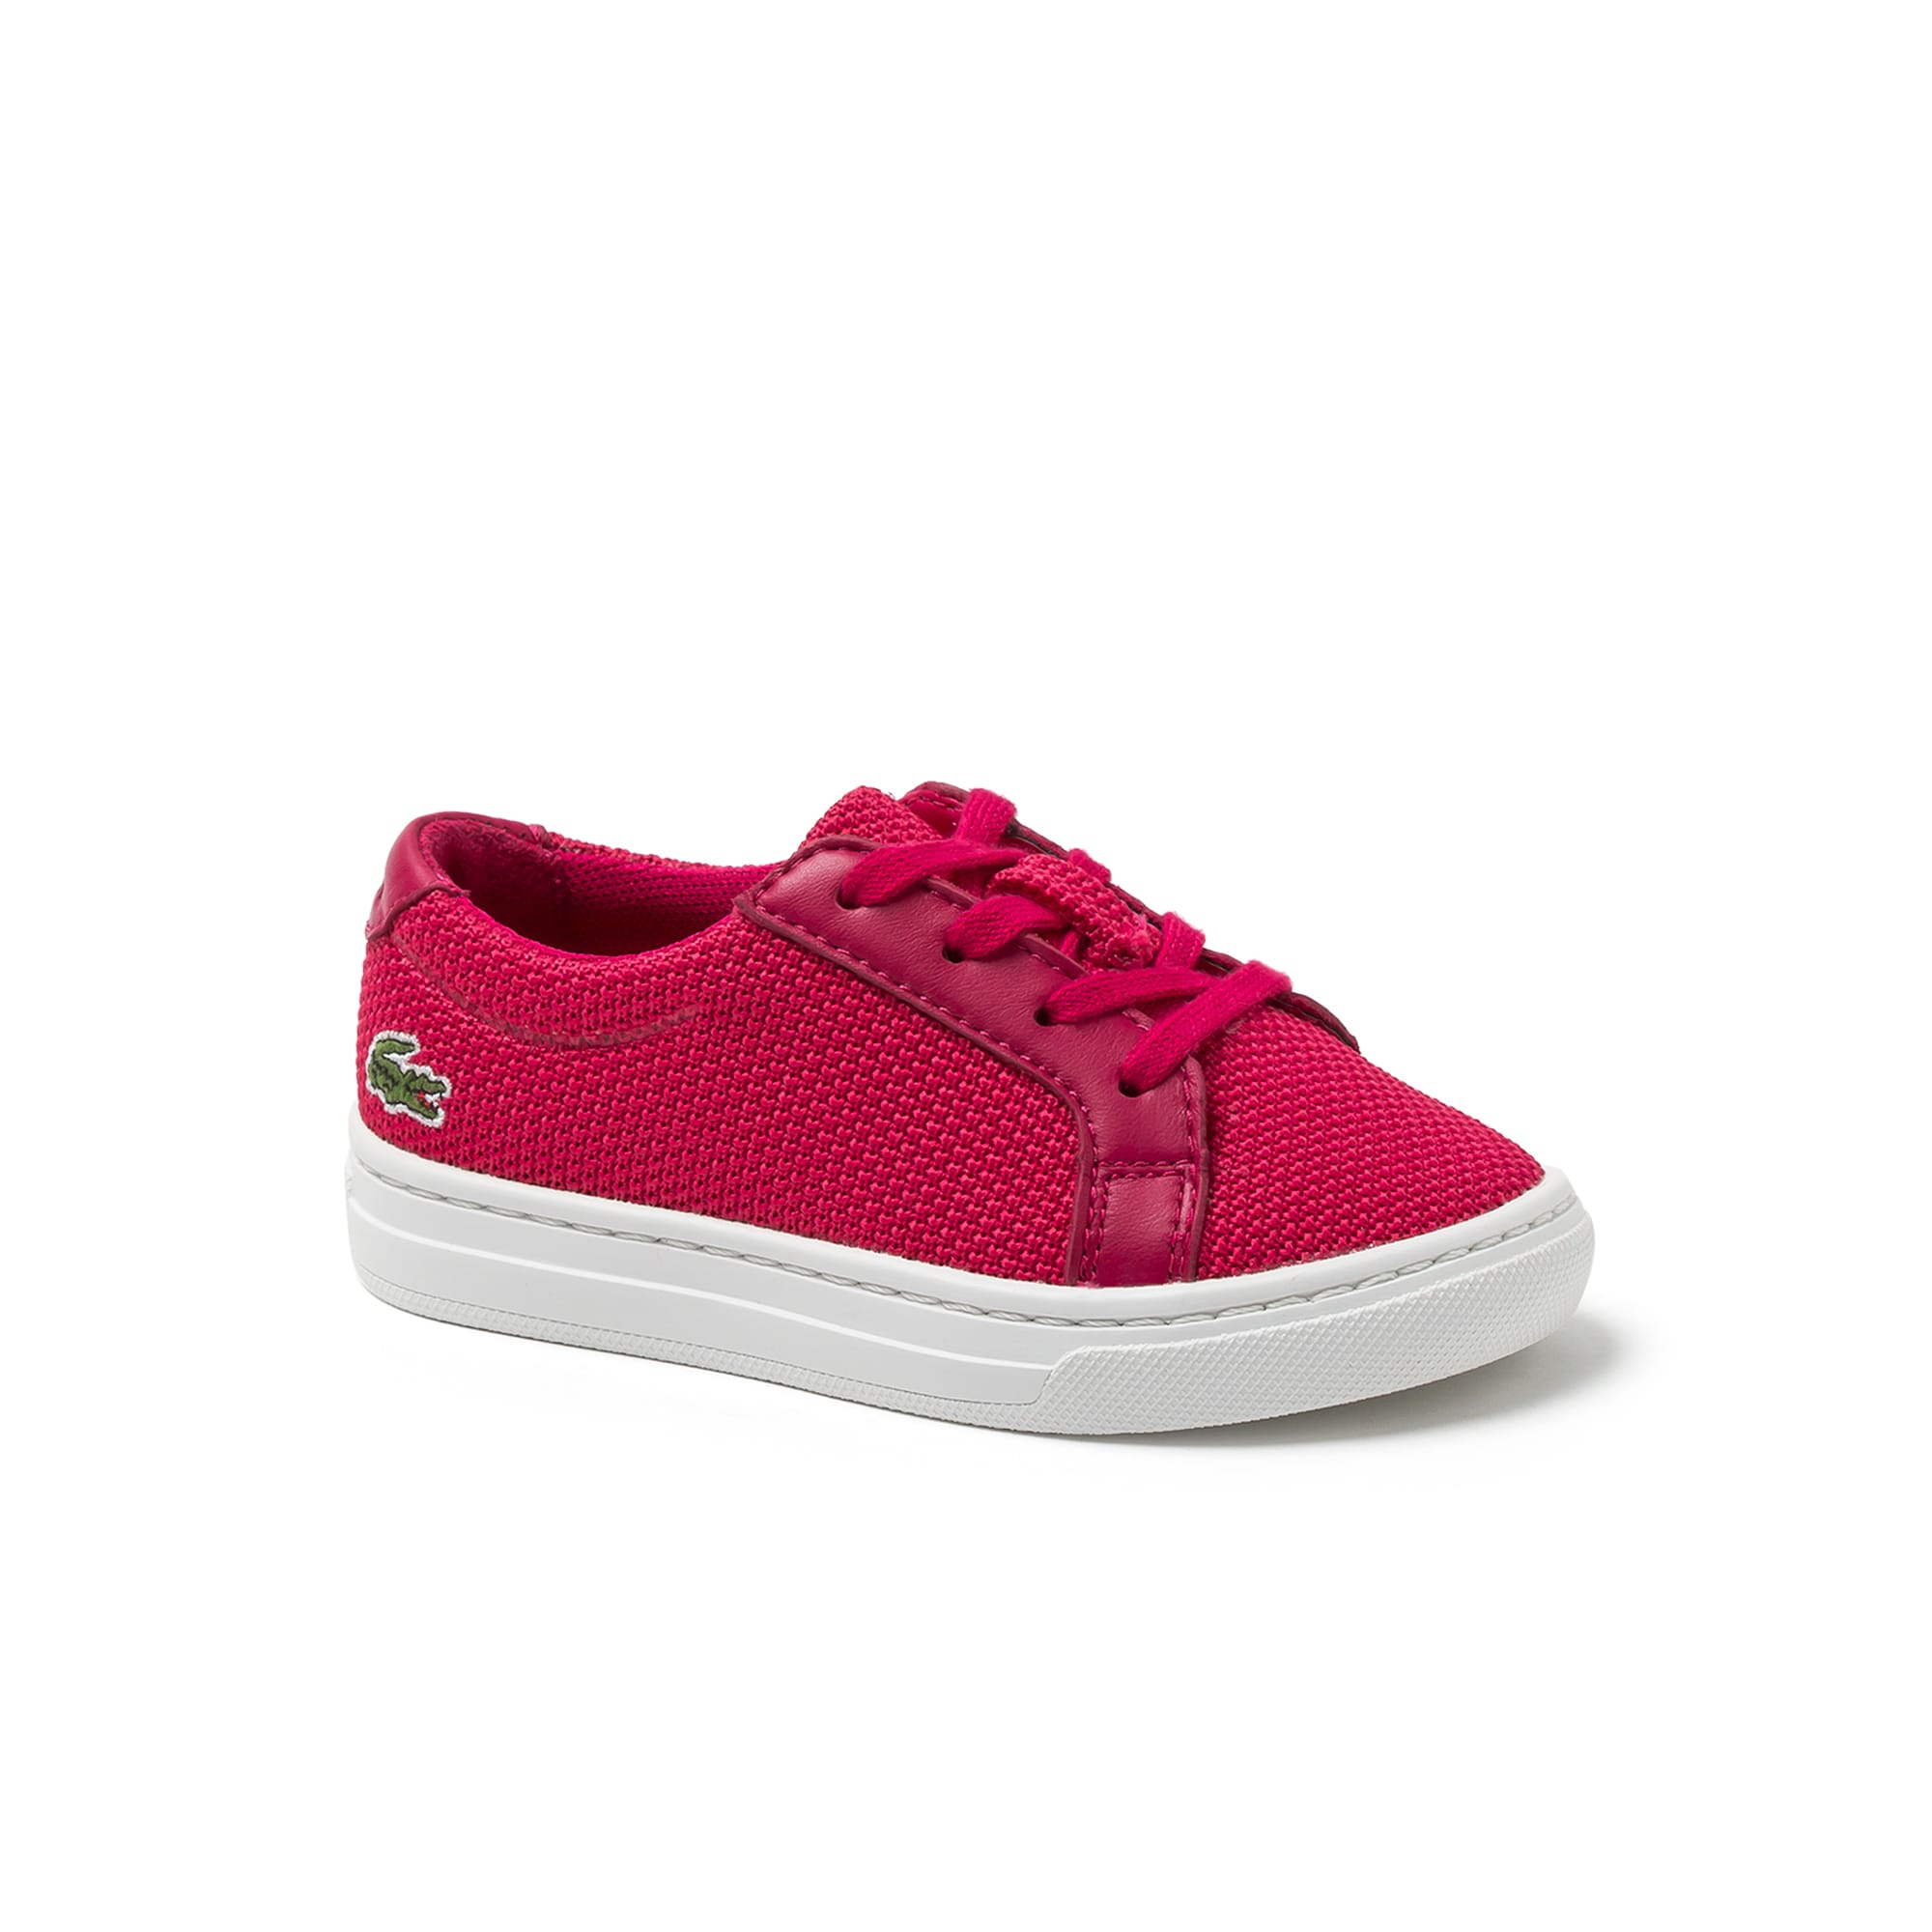 Kids' L.12.12 Textile Sneakers